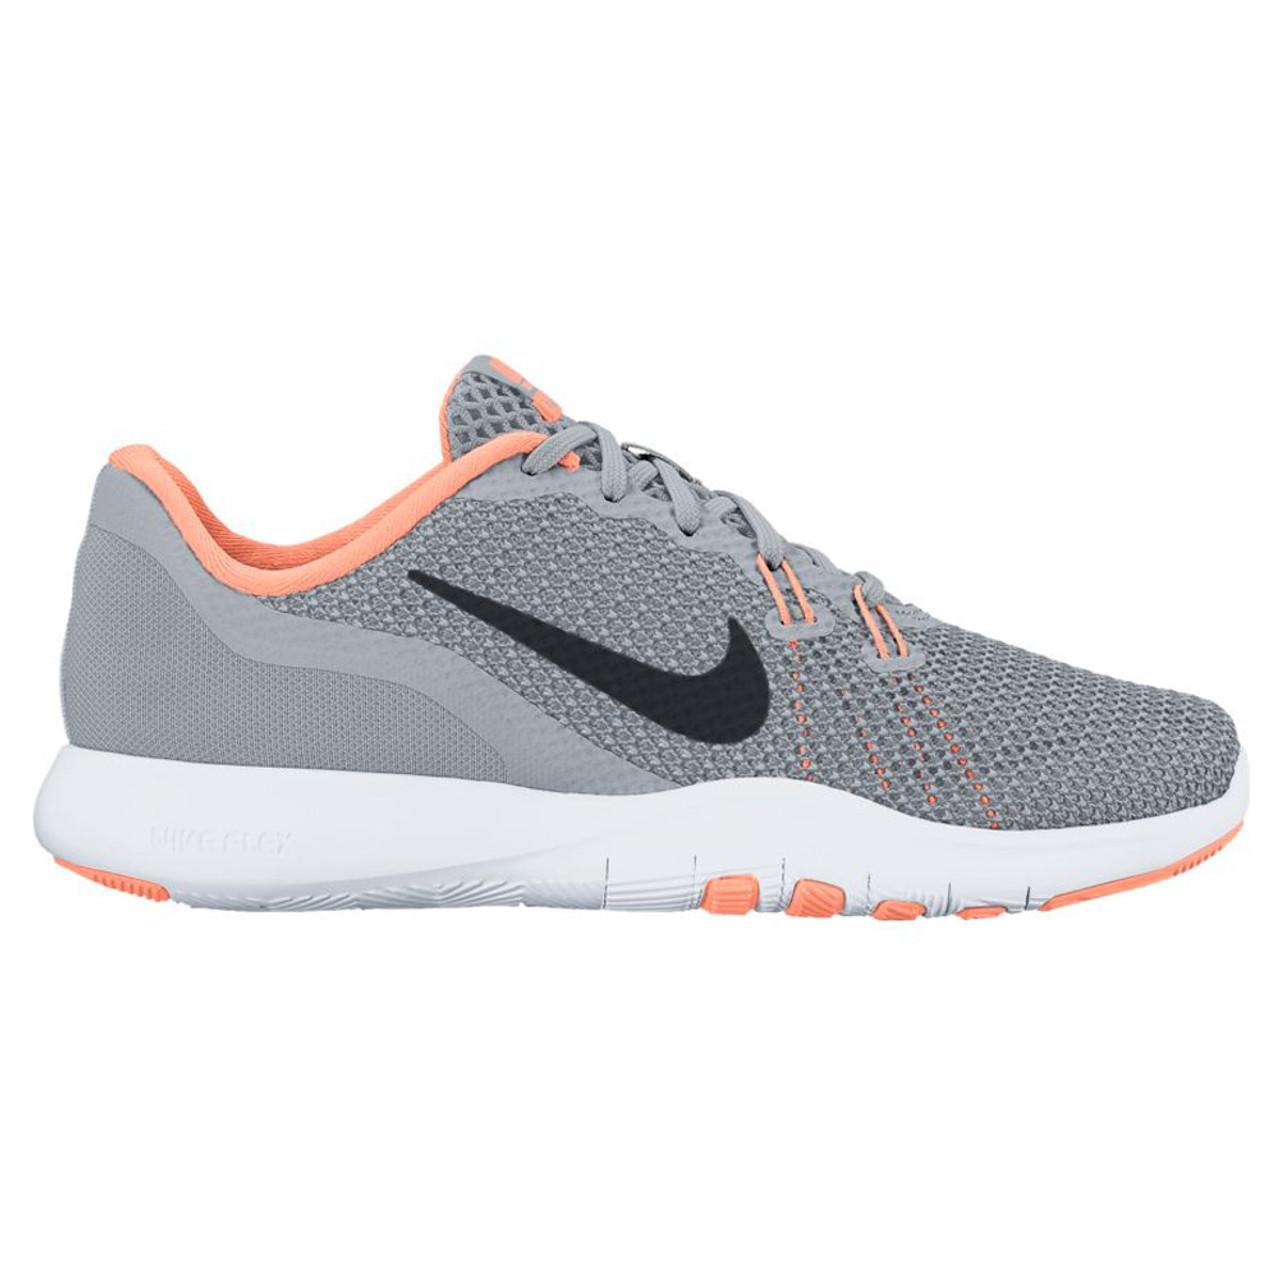 11e6f7b235f03 Nike Women s Flex Trainer 7 Cross Trainer Grey Sunset Glow - Shop now    Shoolu